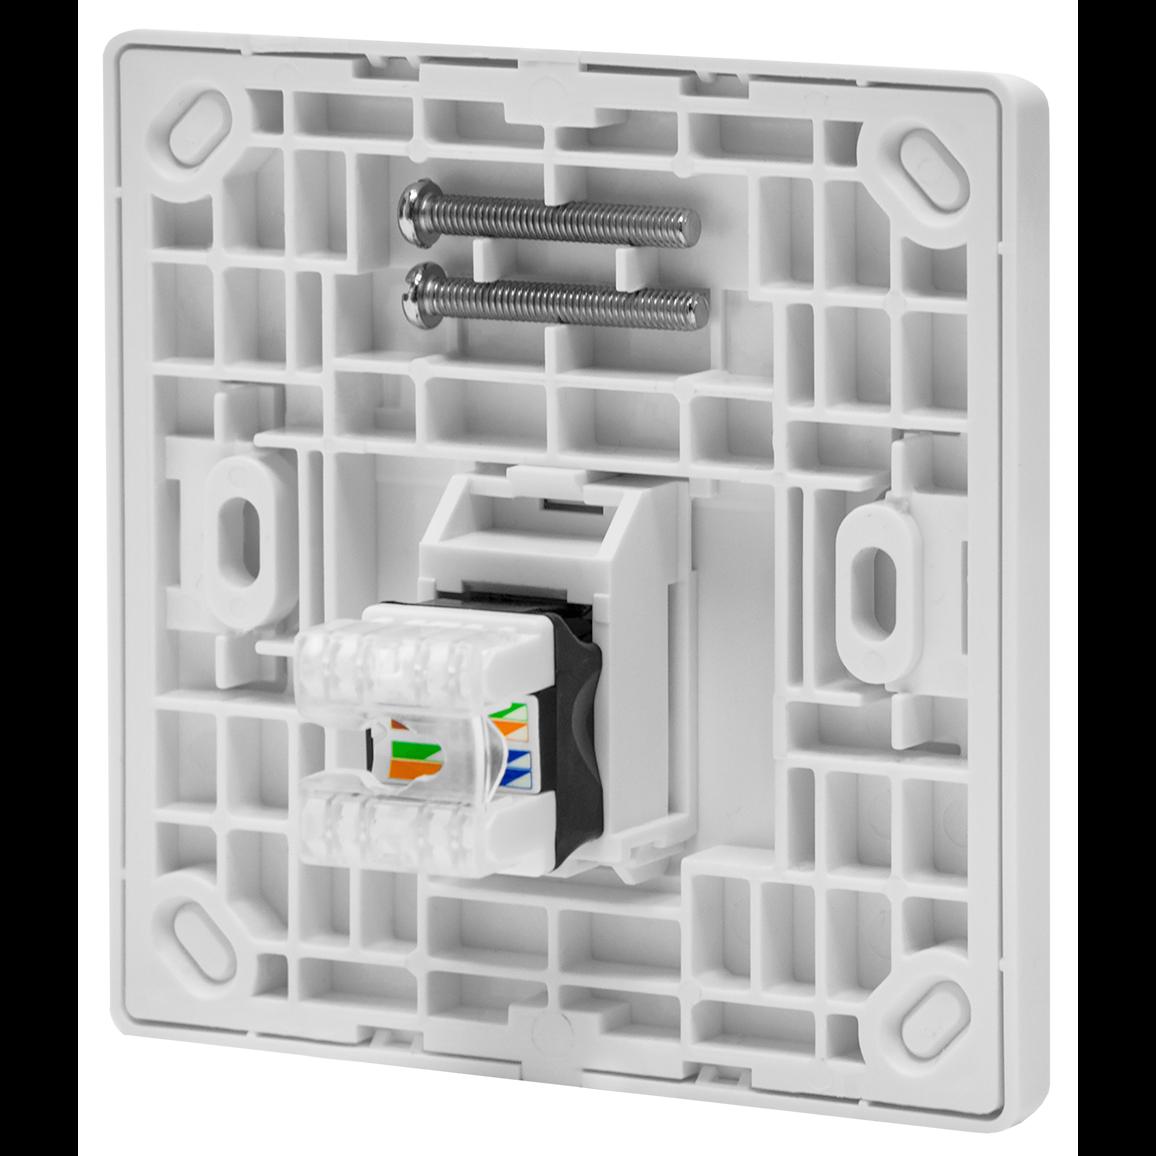 Абонентская розетка SNR, встраиваемая, под модули Keystone, 1 порт